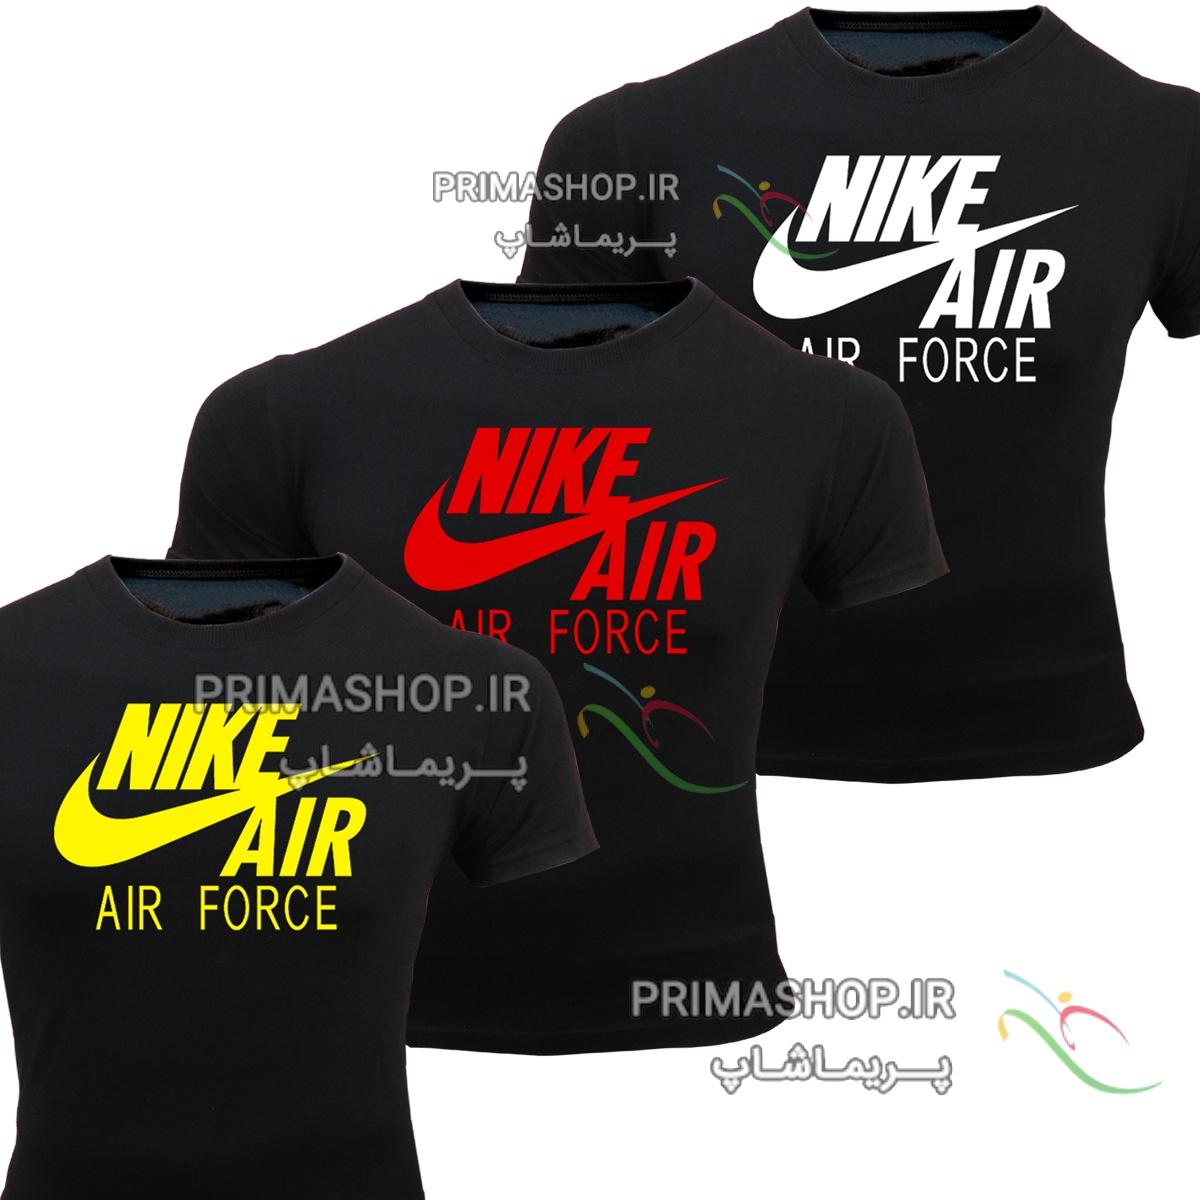 لباس اسپرت  نایک  مردانه طرح Air force مشکی